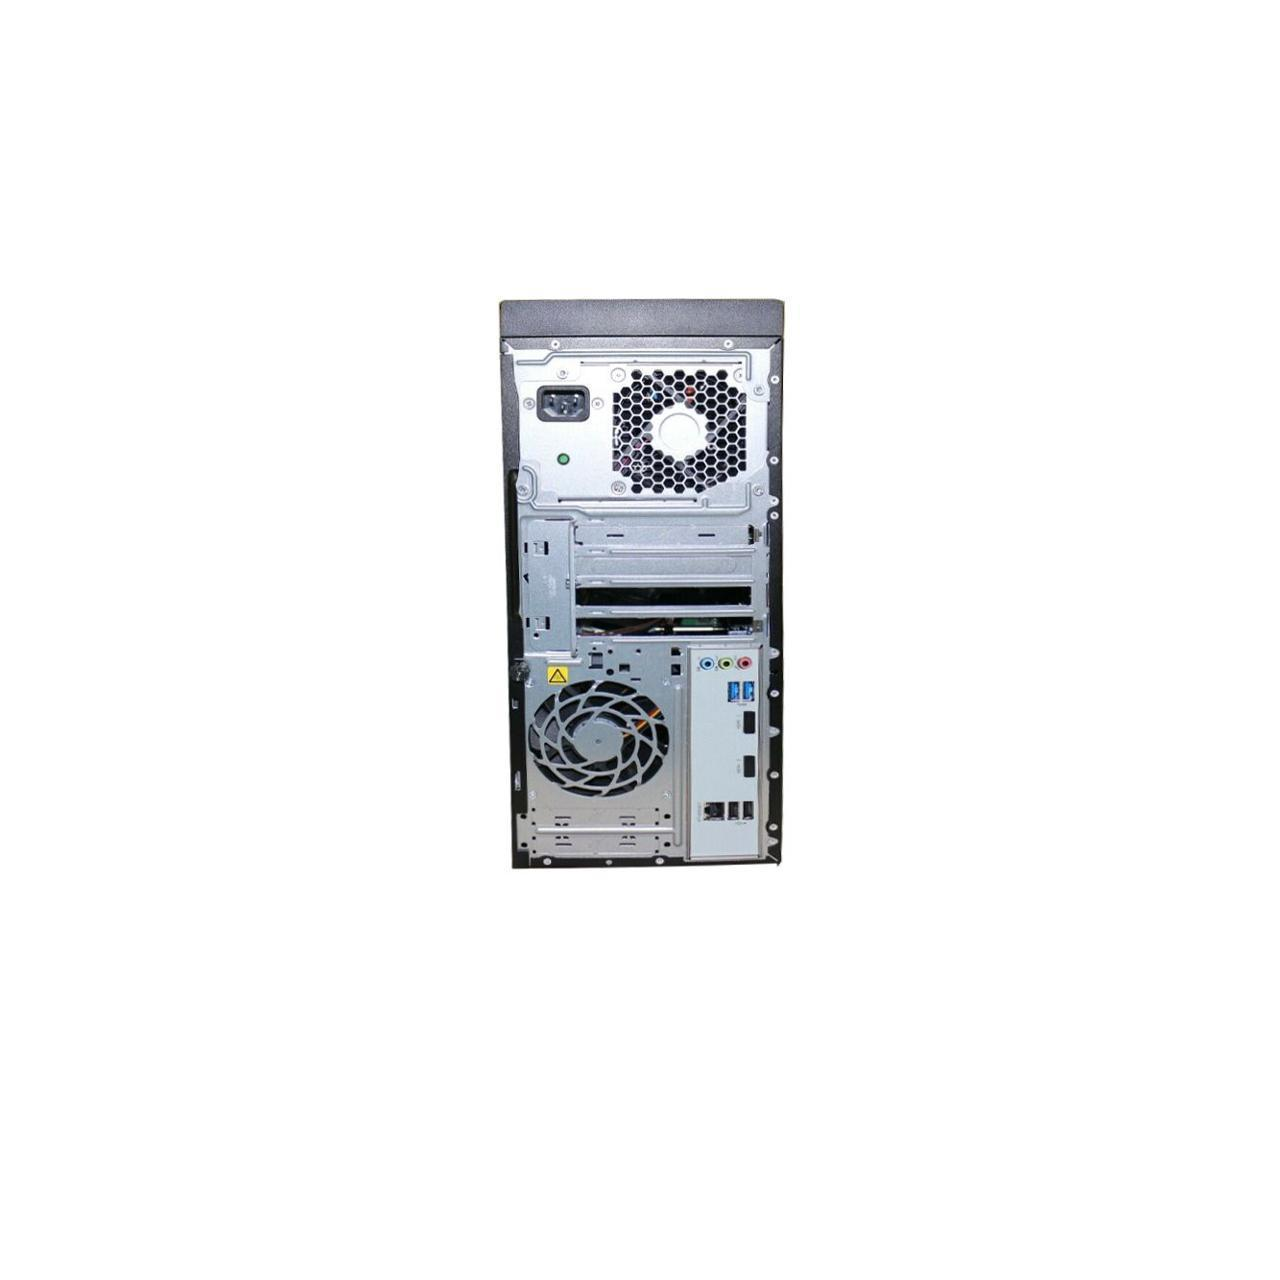 Hp Envy DT 750-415 V9B09AAR ABA Core i5 2.70 GHz - SSD 128 GB + HDD 1 TB RAM 8GB